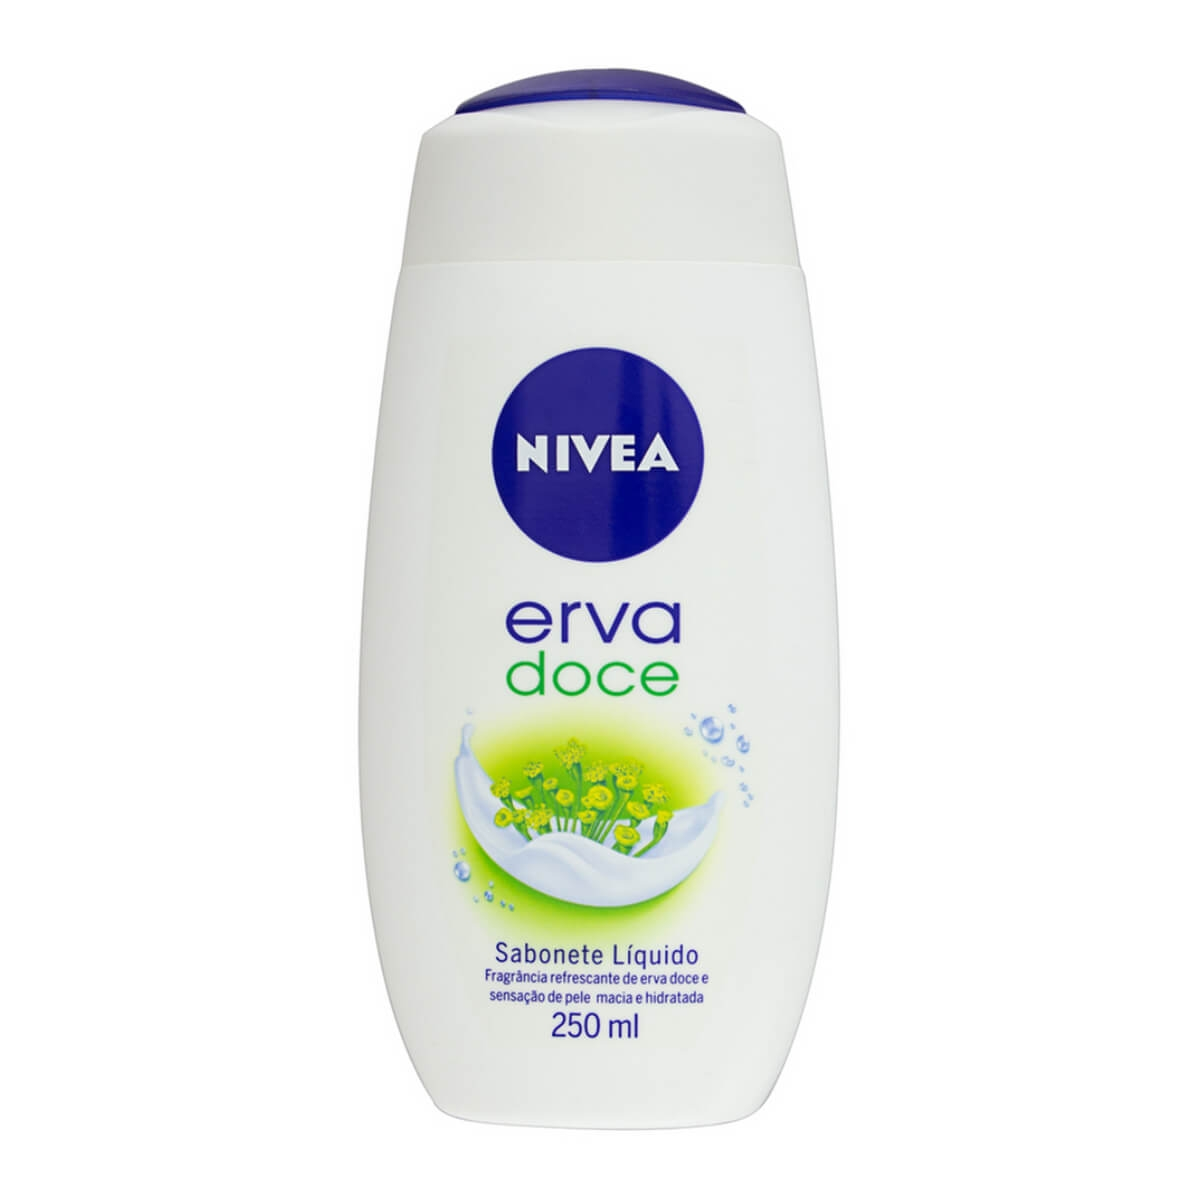 Sabonete Líquido Nivea Erva Doce 250ml